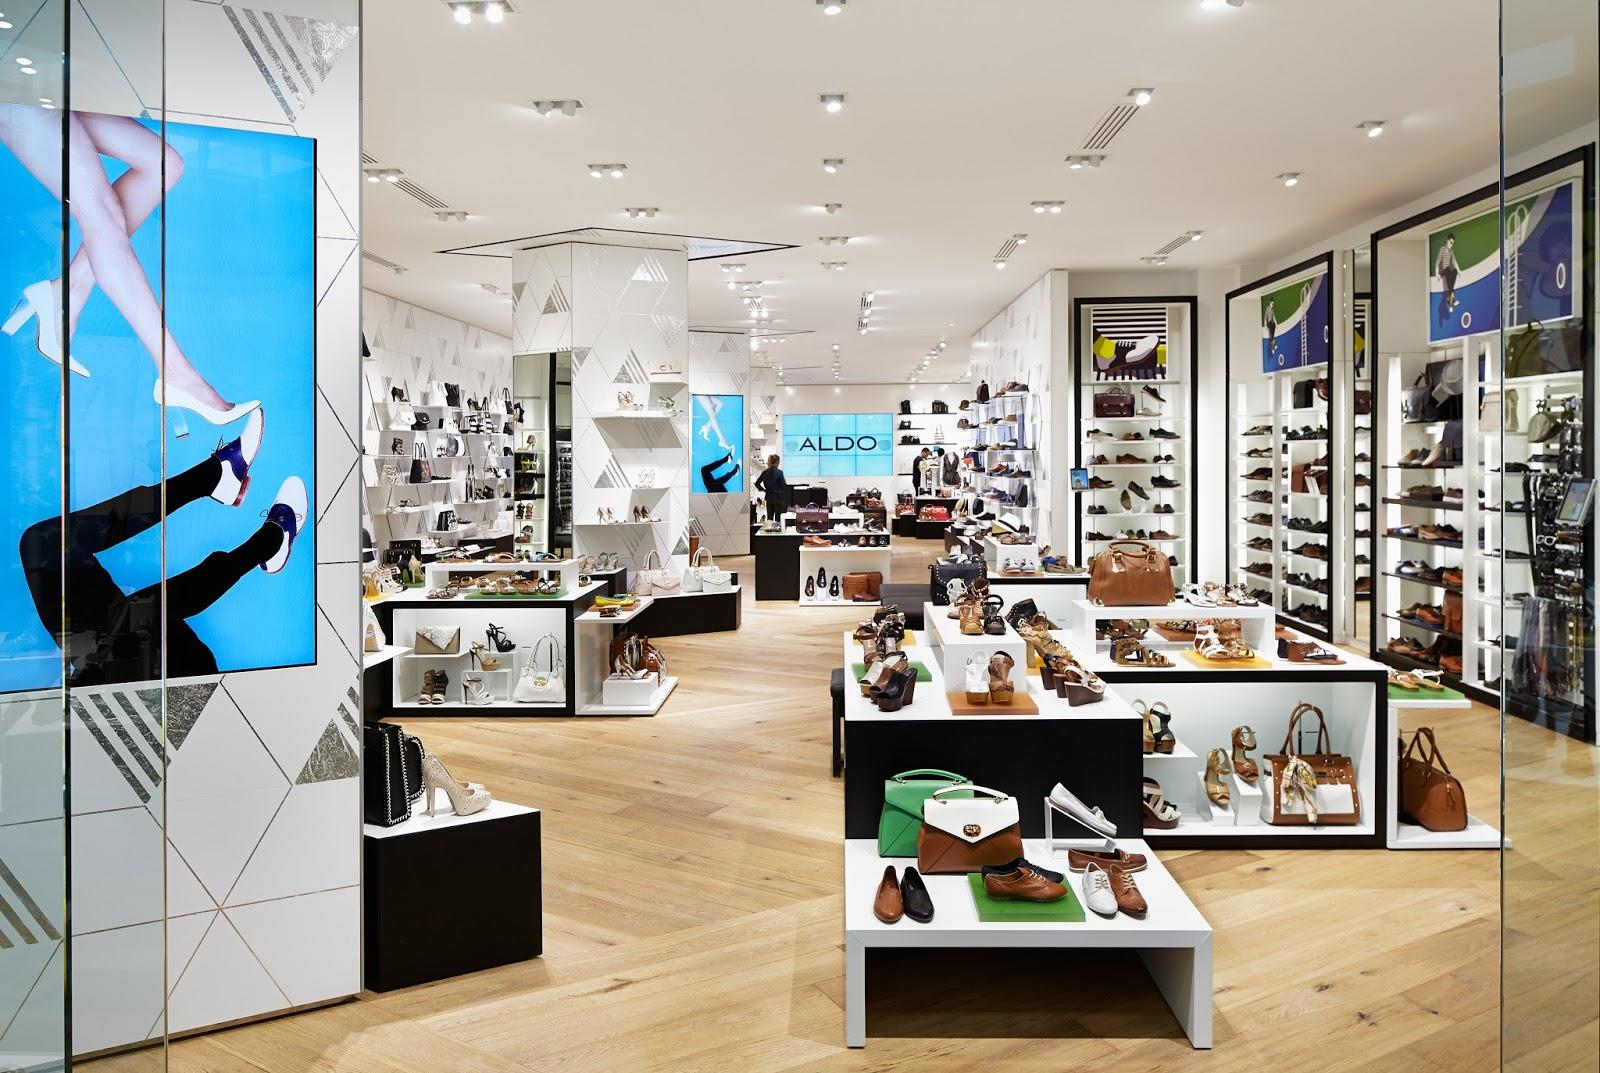 OUYEE chic shoe shop interior design popular for chain shop-3